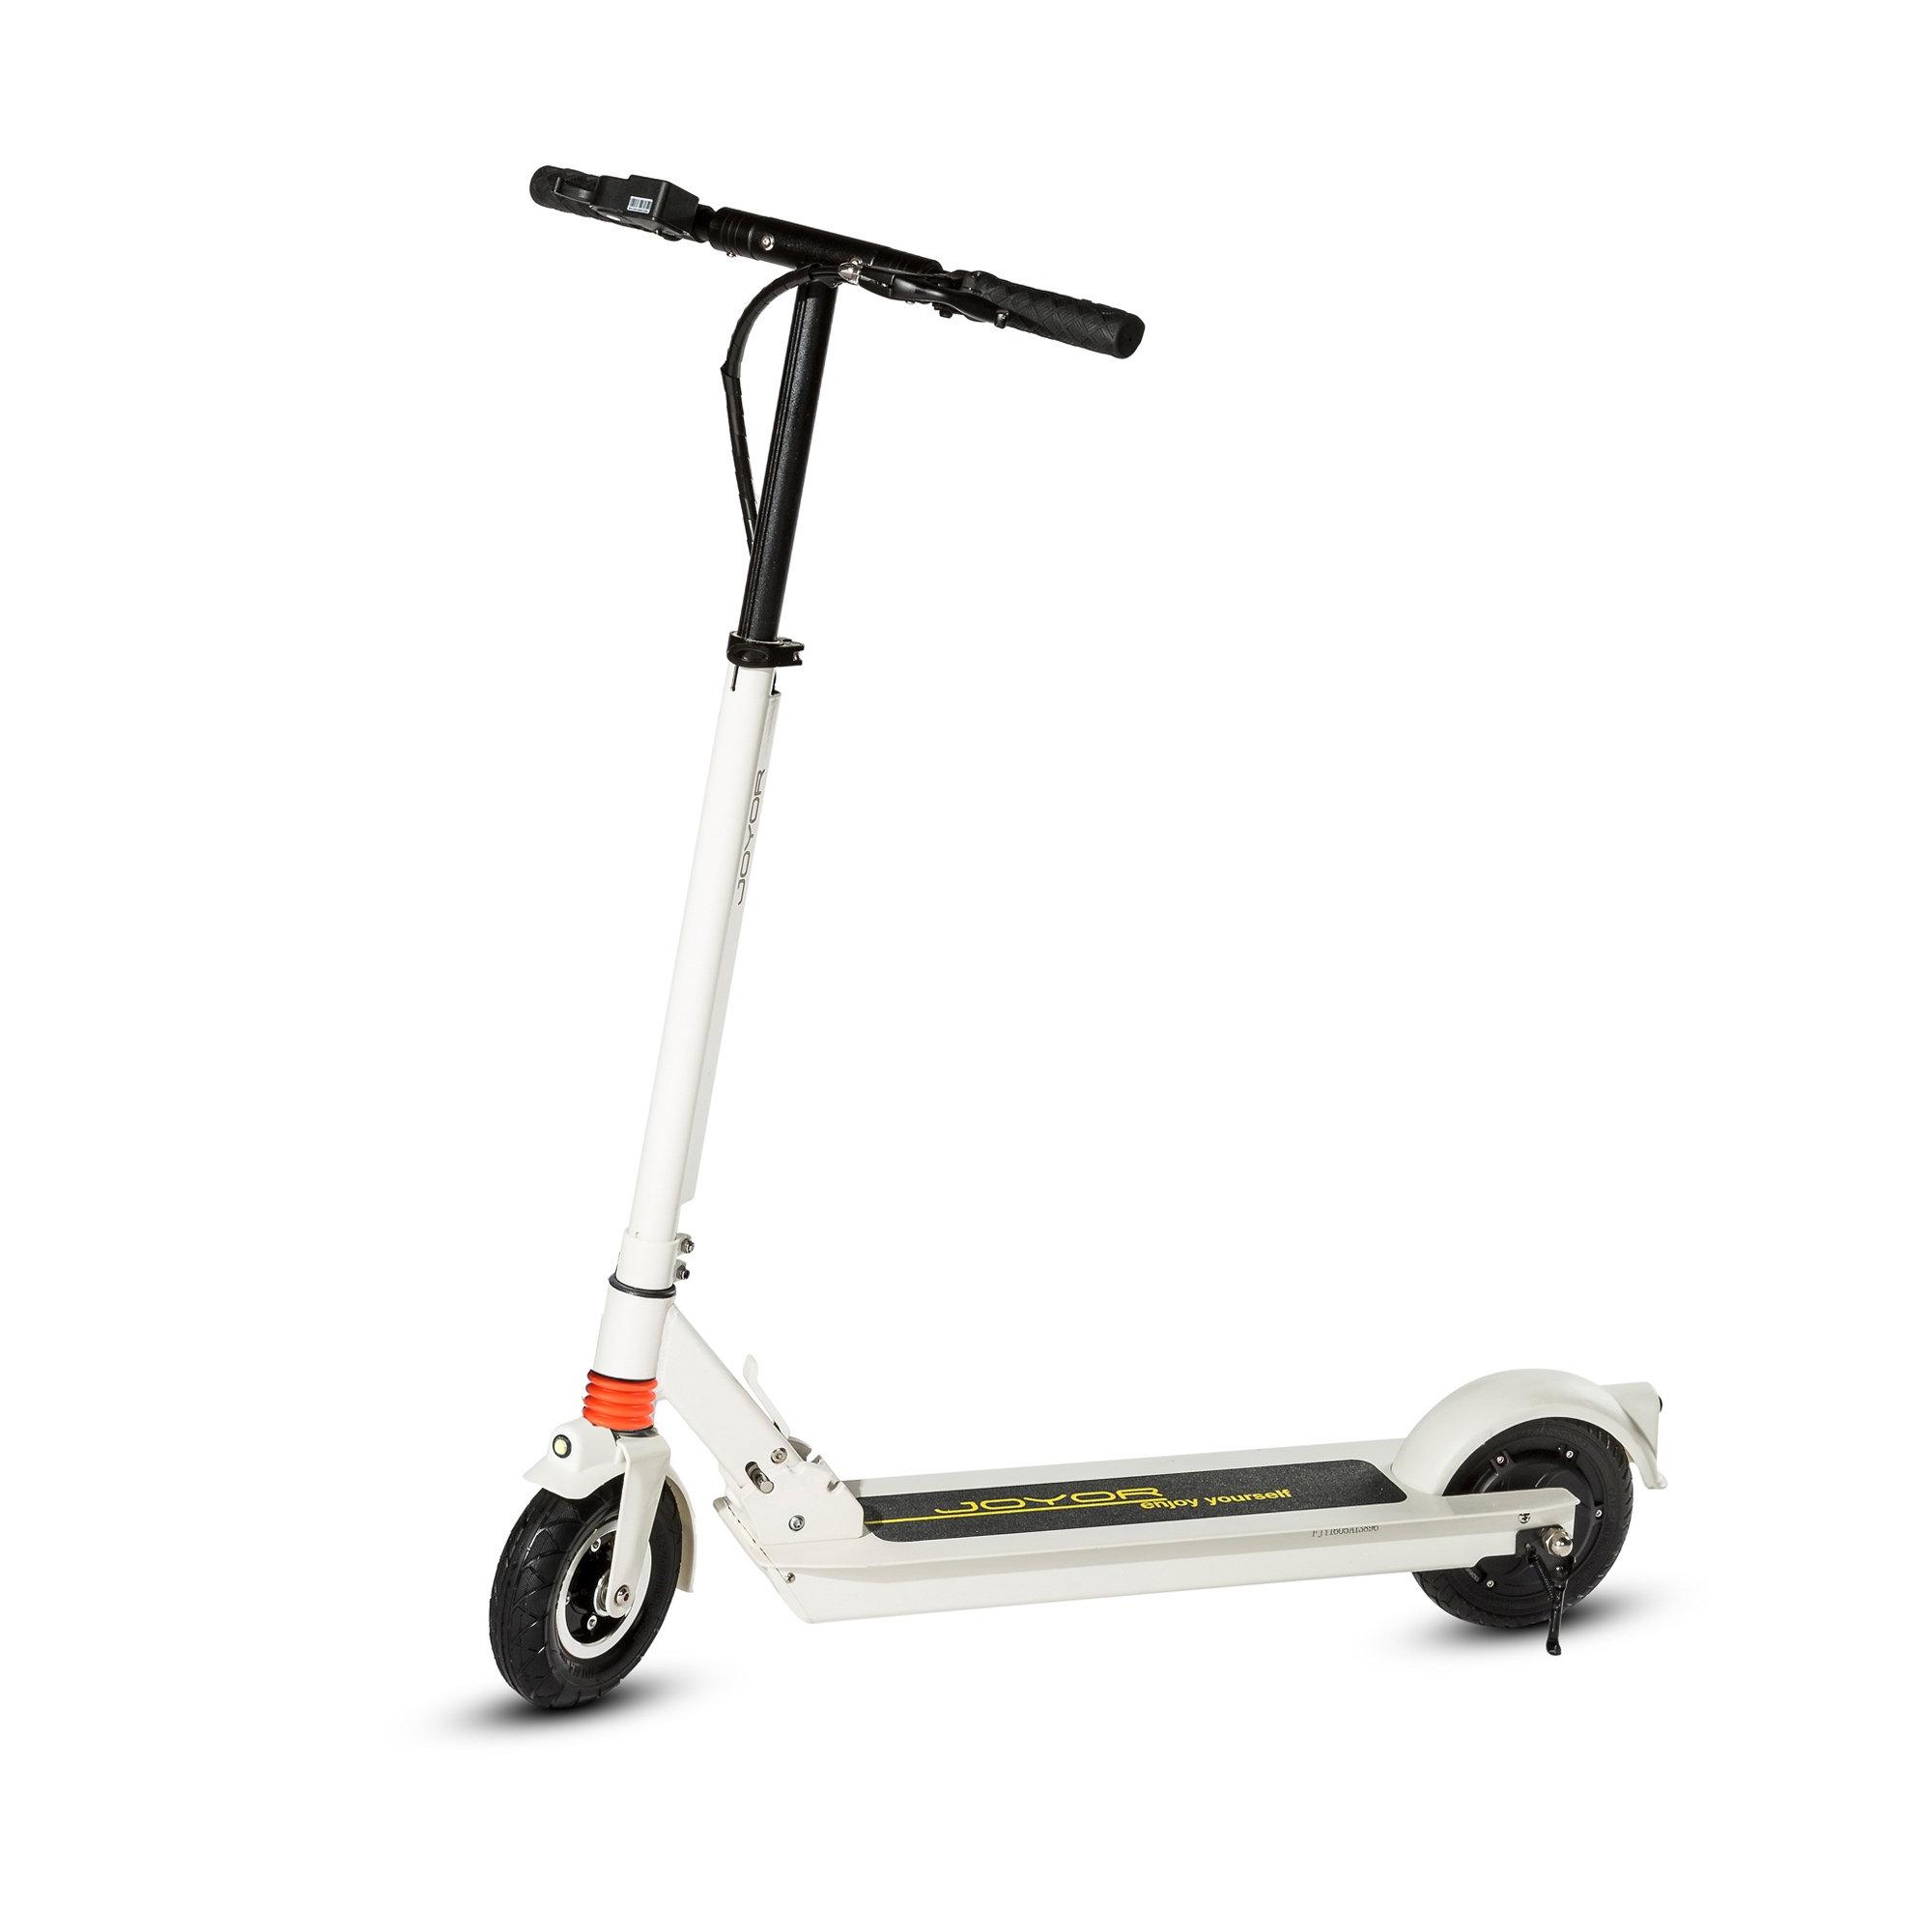 Electric scooter Joyor F5 Black, 350W, 35km/h, Distance 55-60km